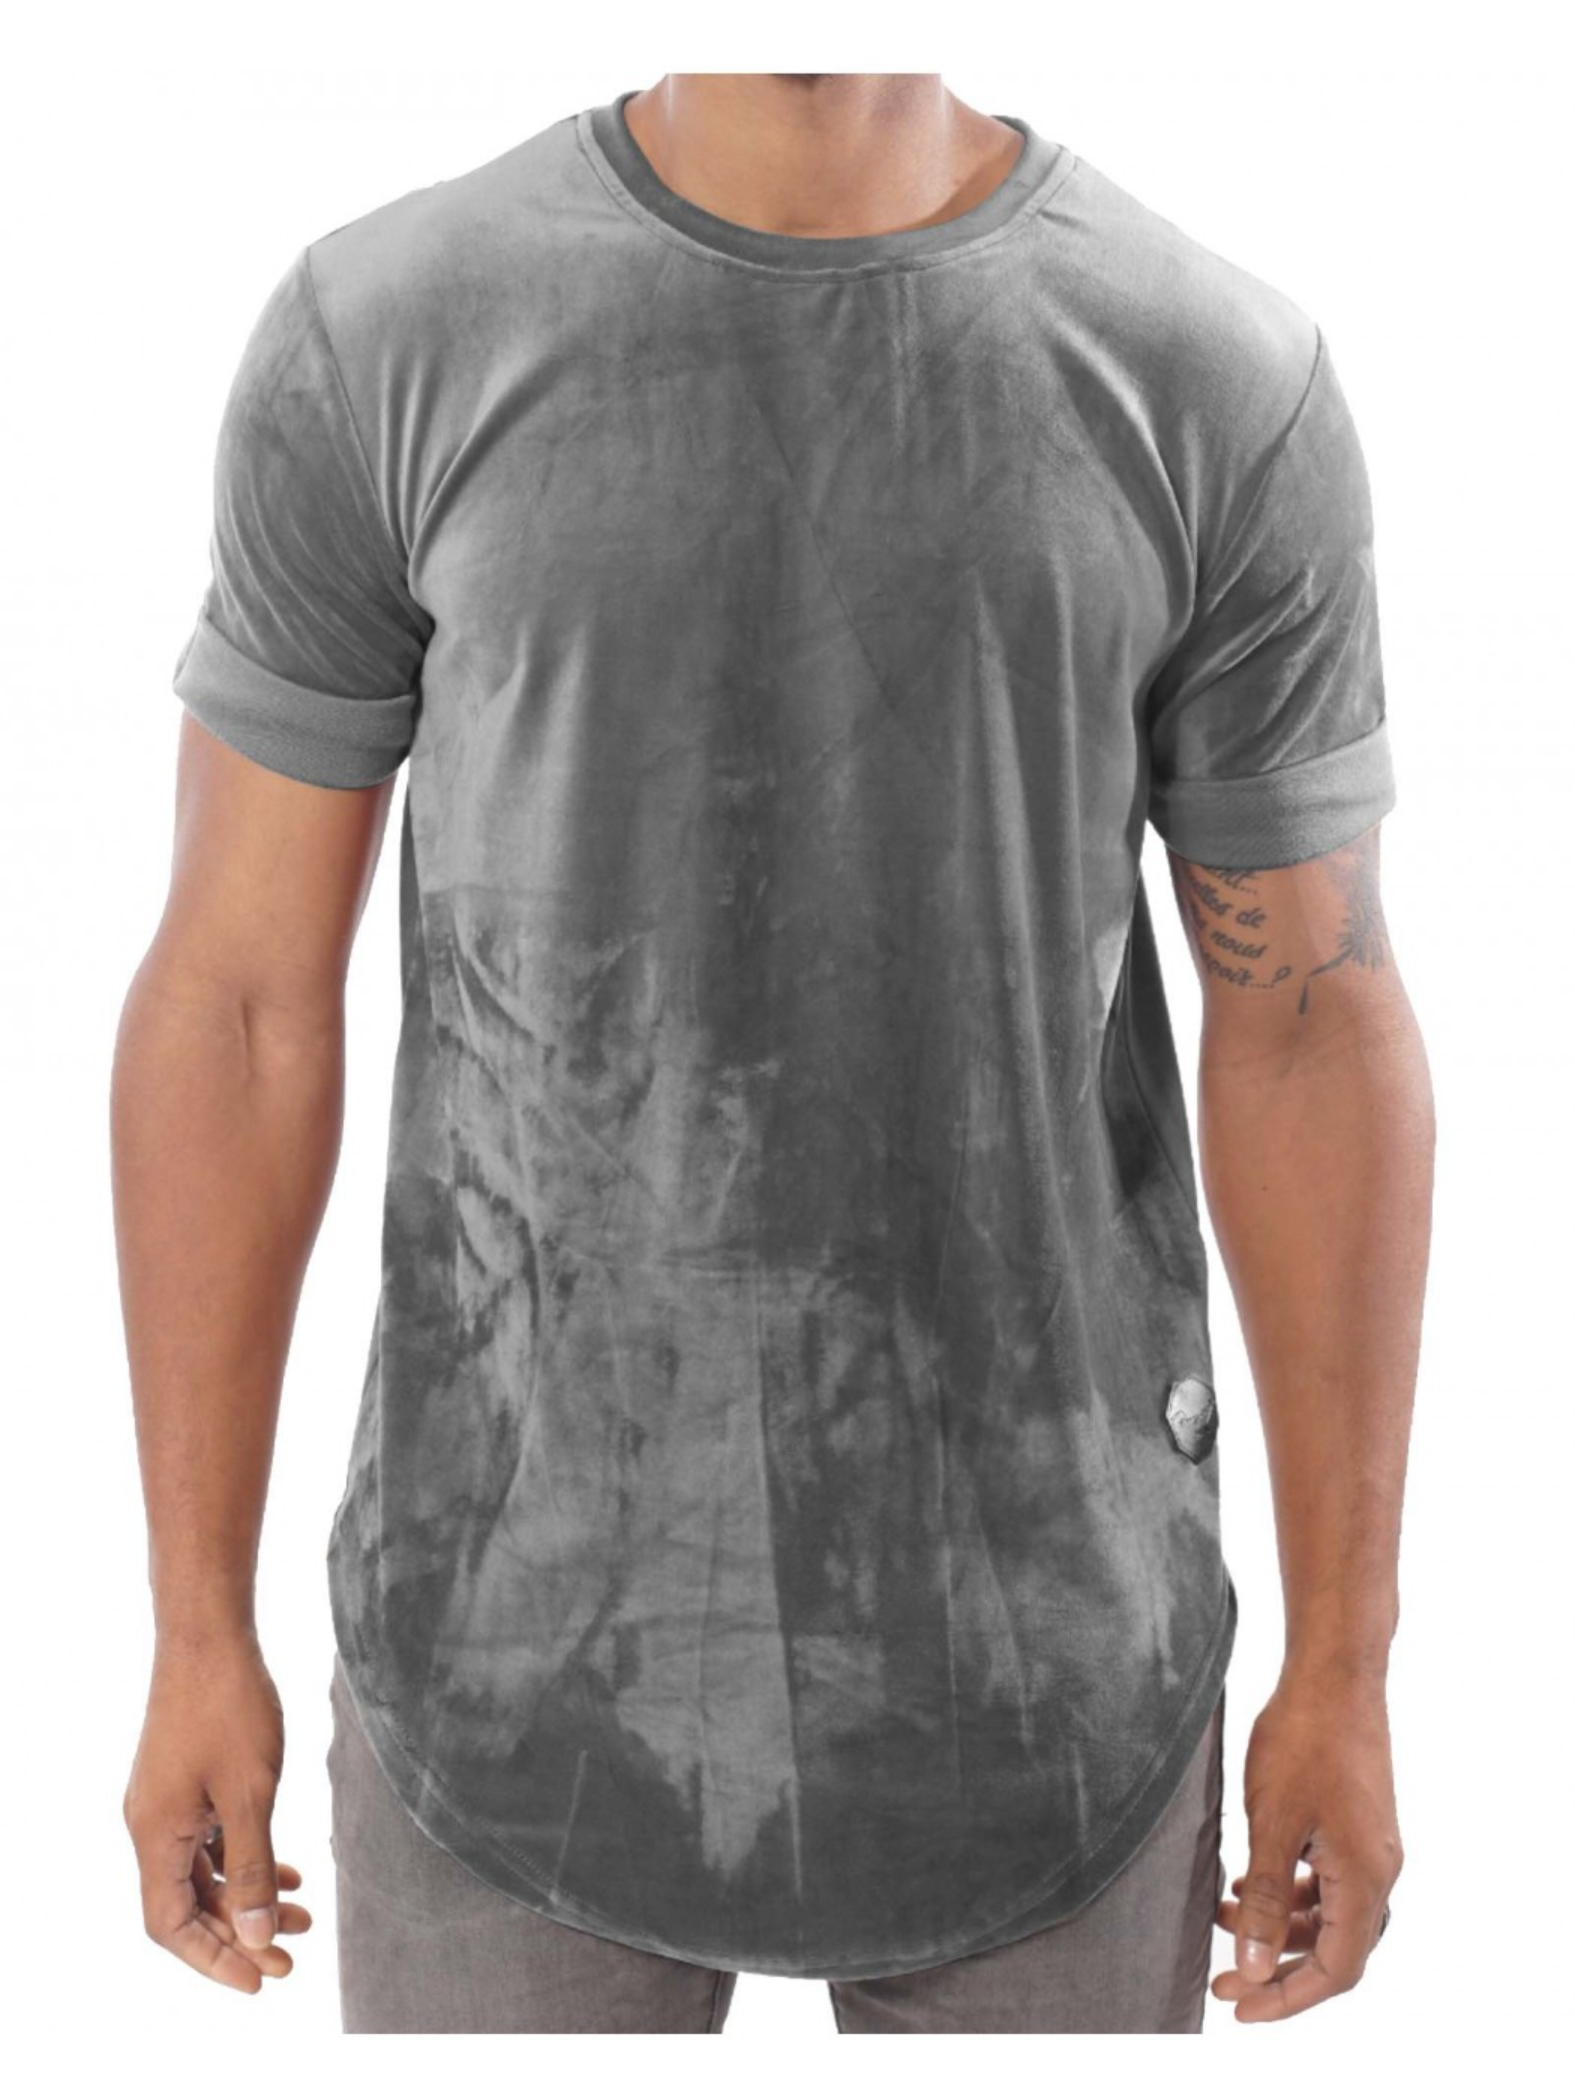 tee shirt en velours oversize homme project x paris 88161135. Black Bedroom Furniture Sets. Home Design Ideas